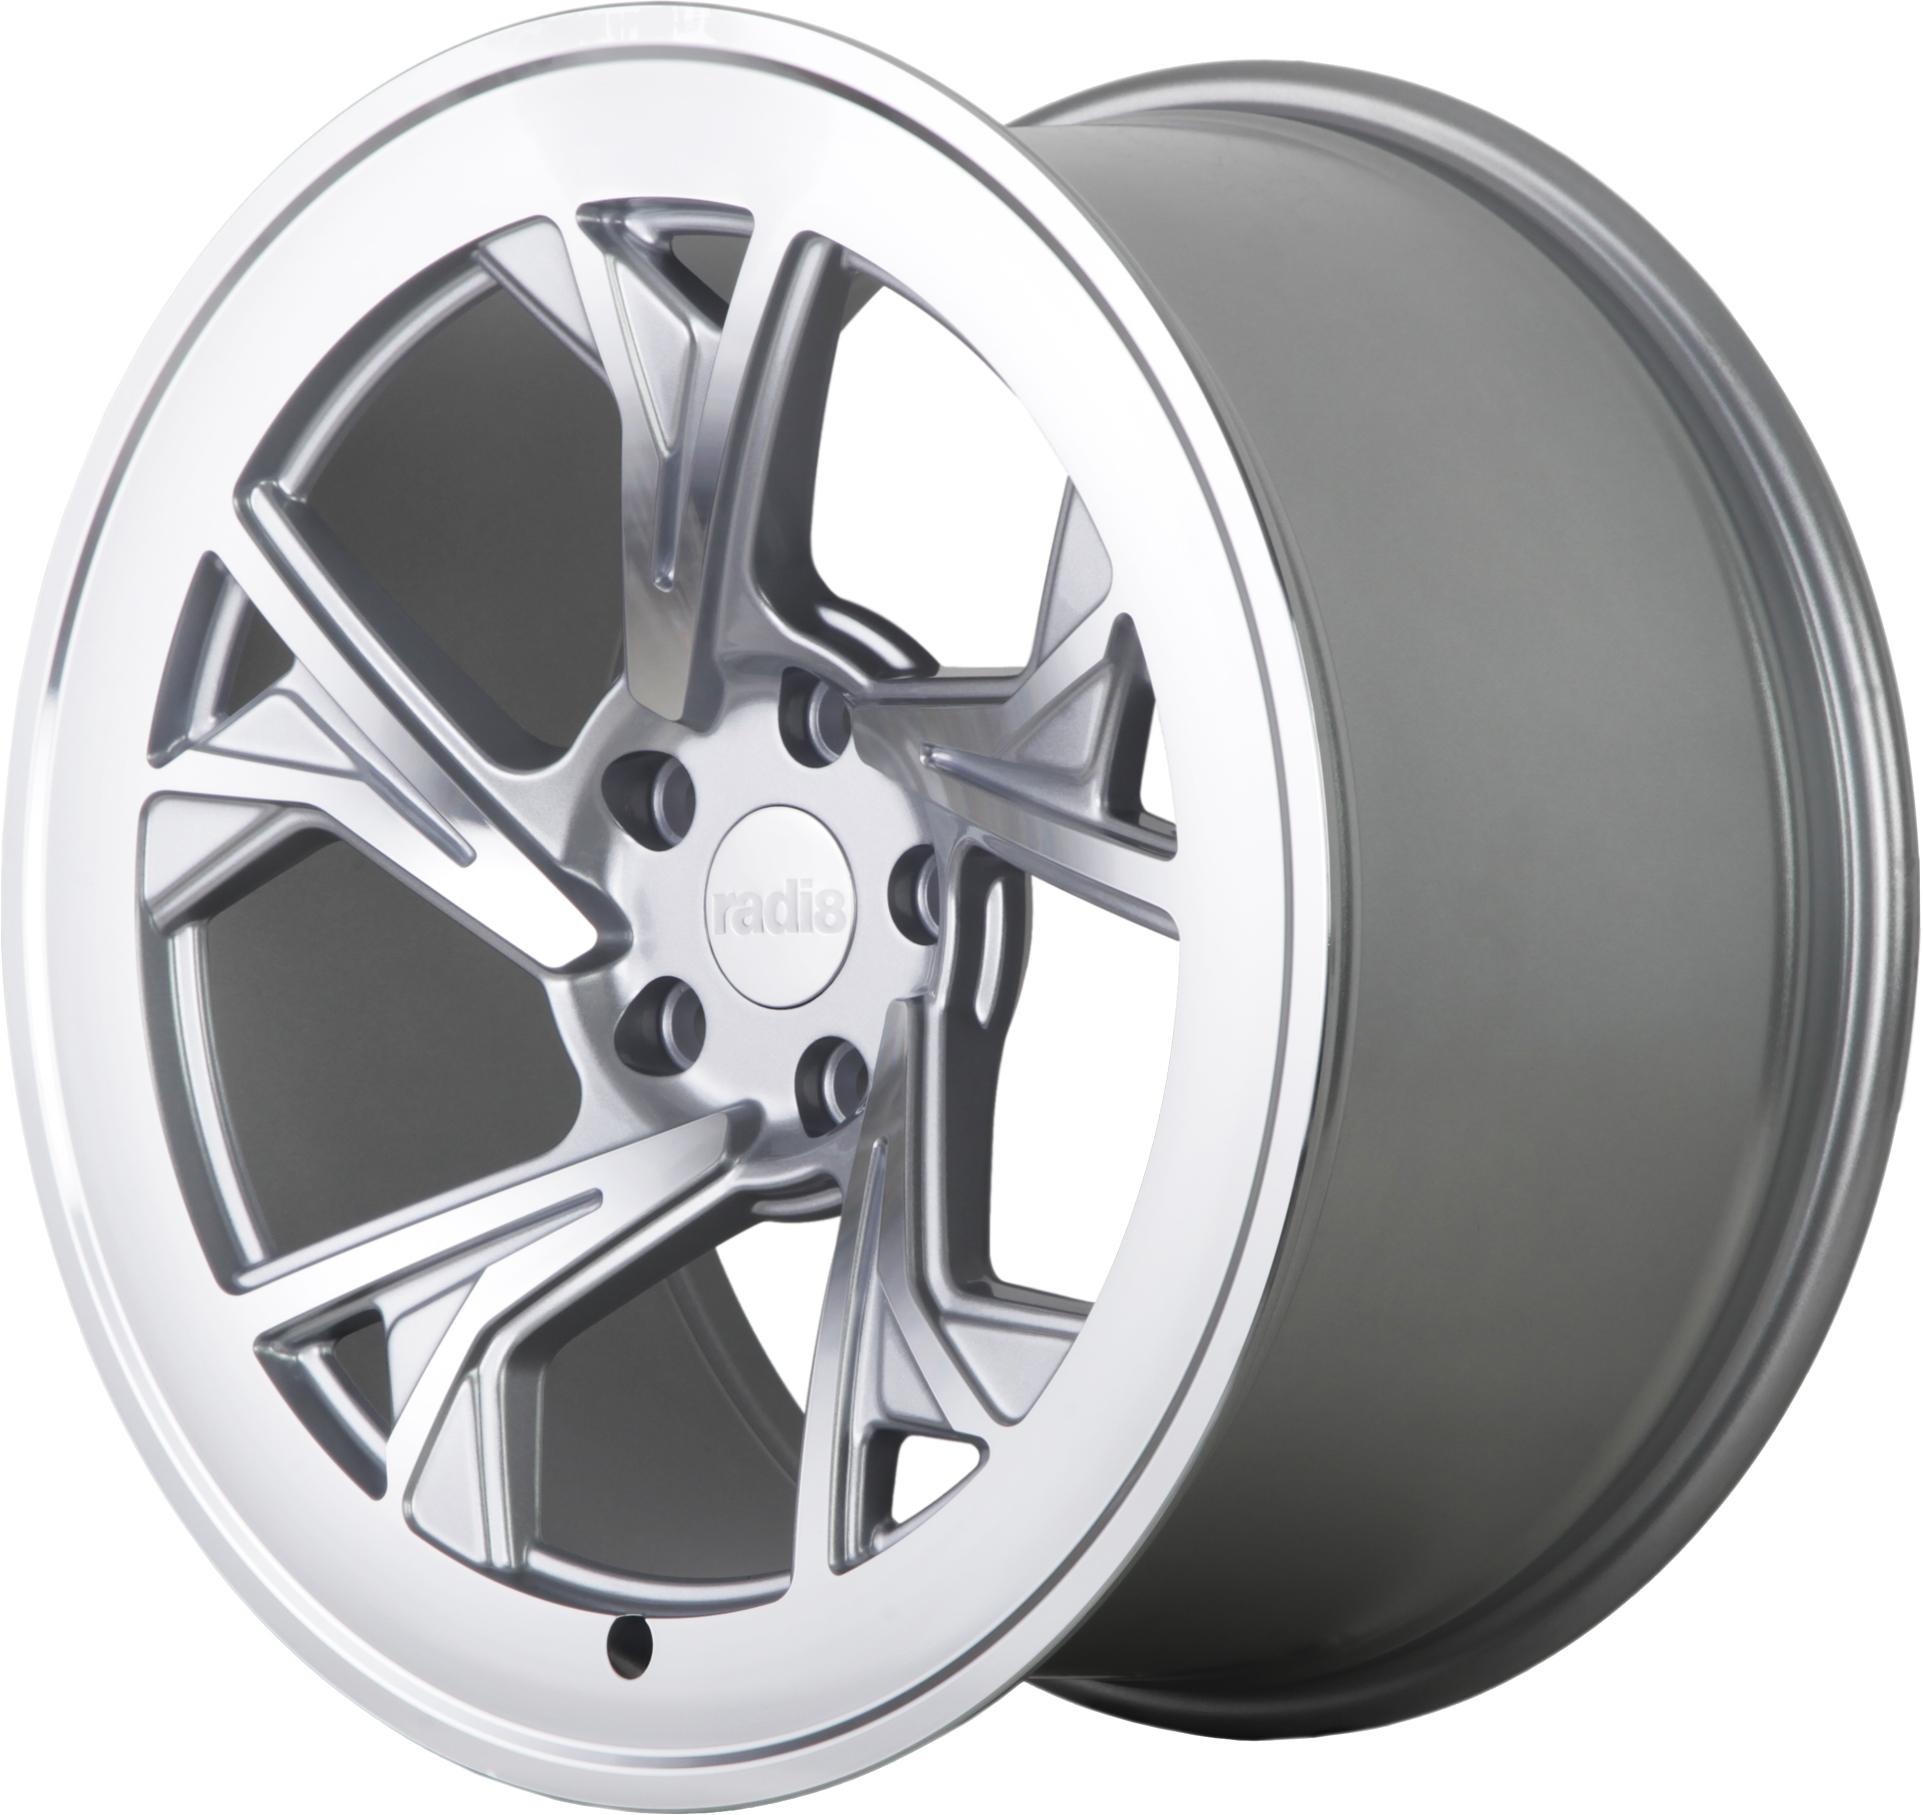 Radi8 R8C5 wheels in Matte Silver for Subaru